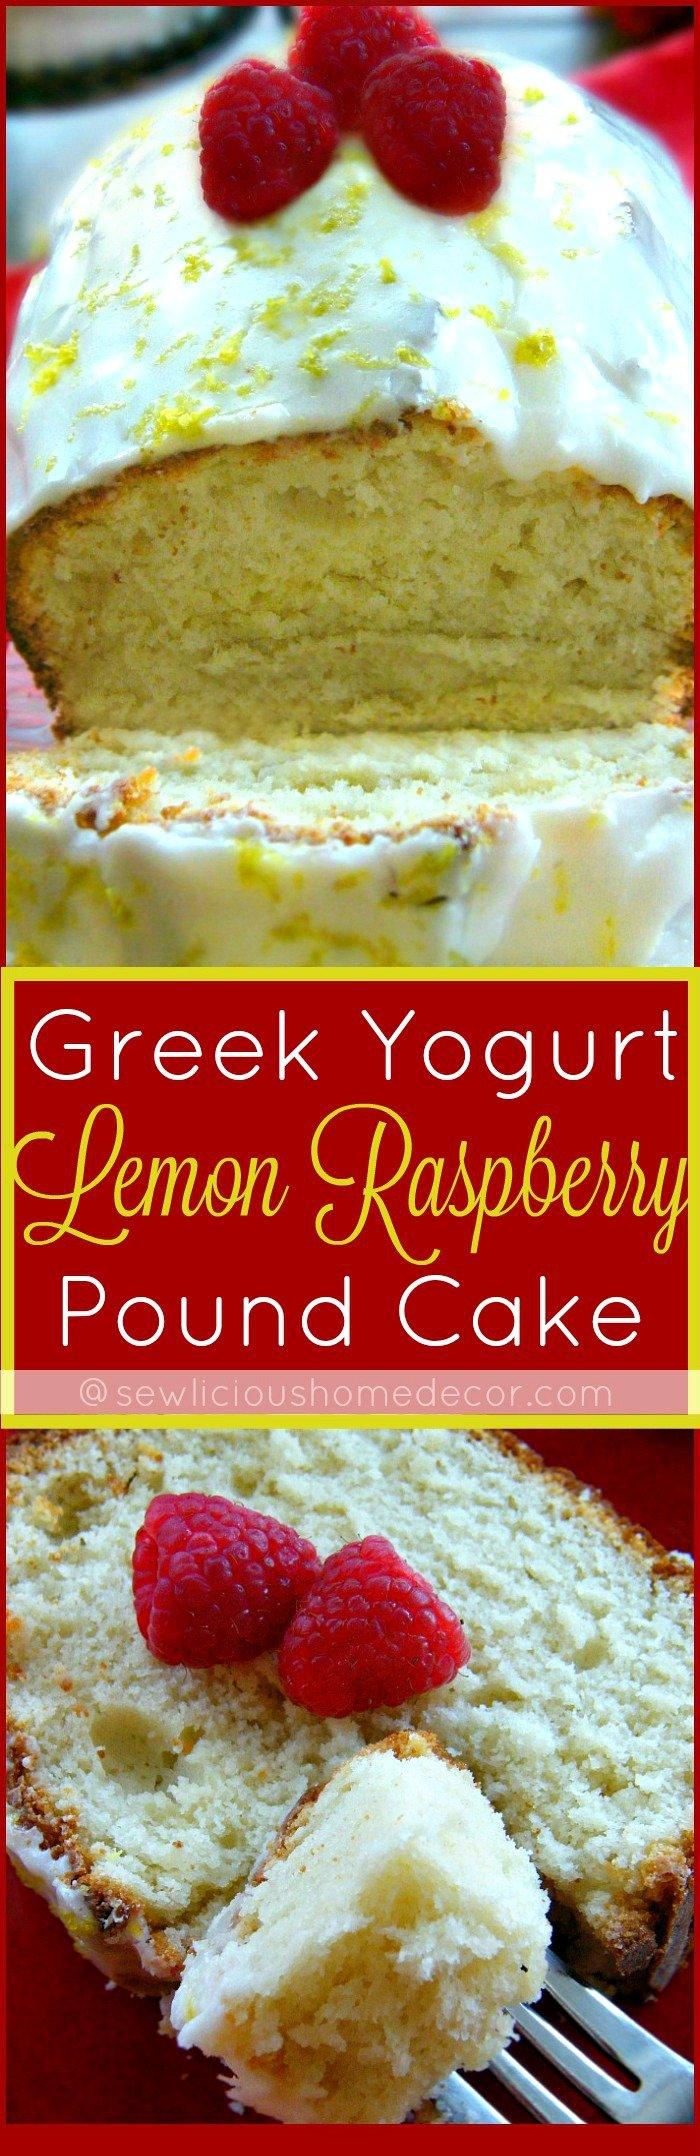 Greek Yogurt Lemon Raspberry Pound Cake sewlicioushomedecor.com